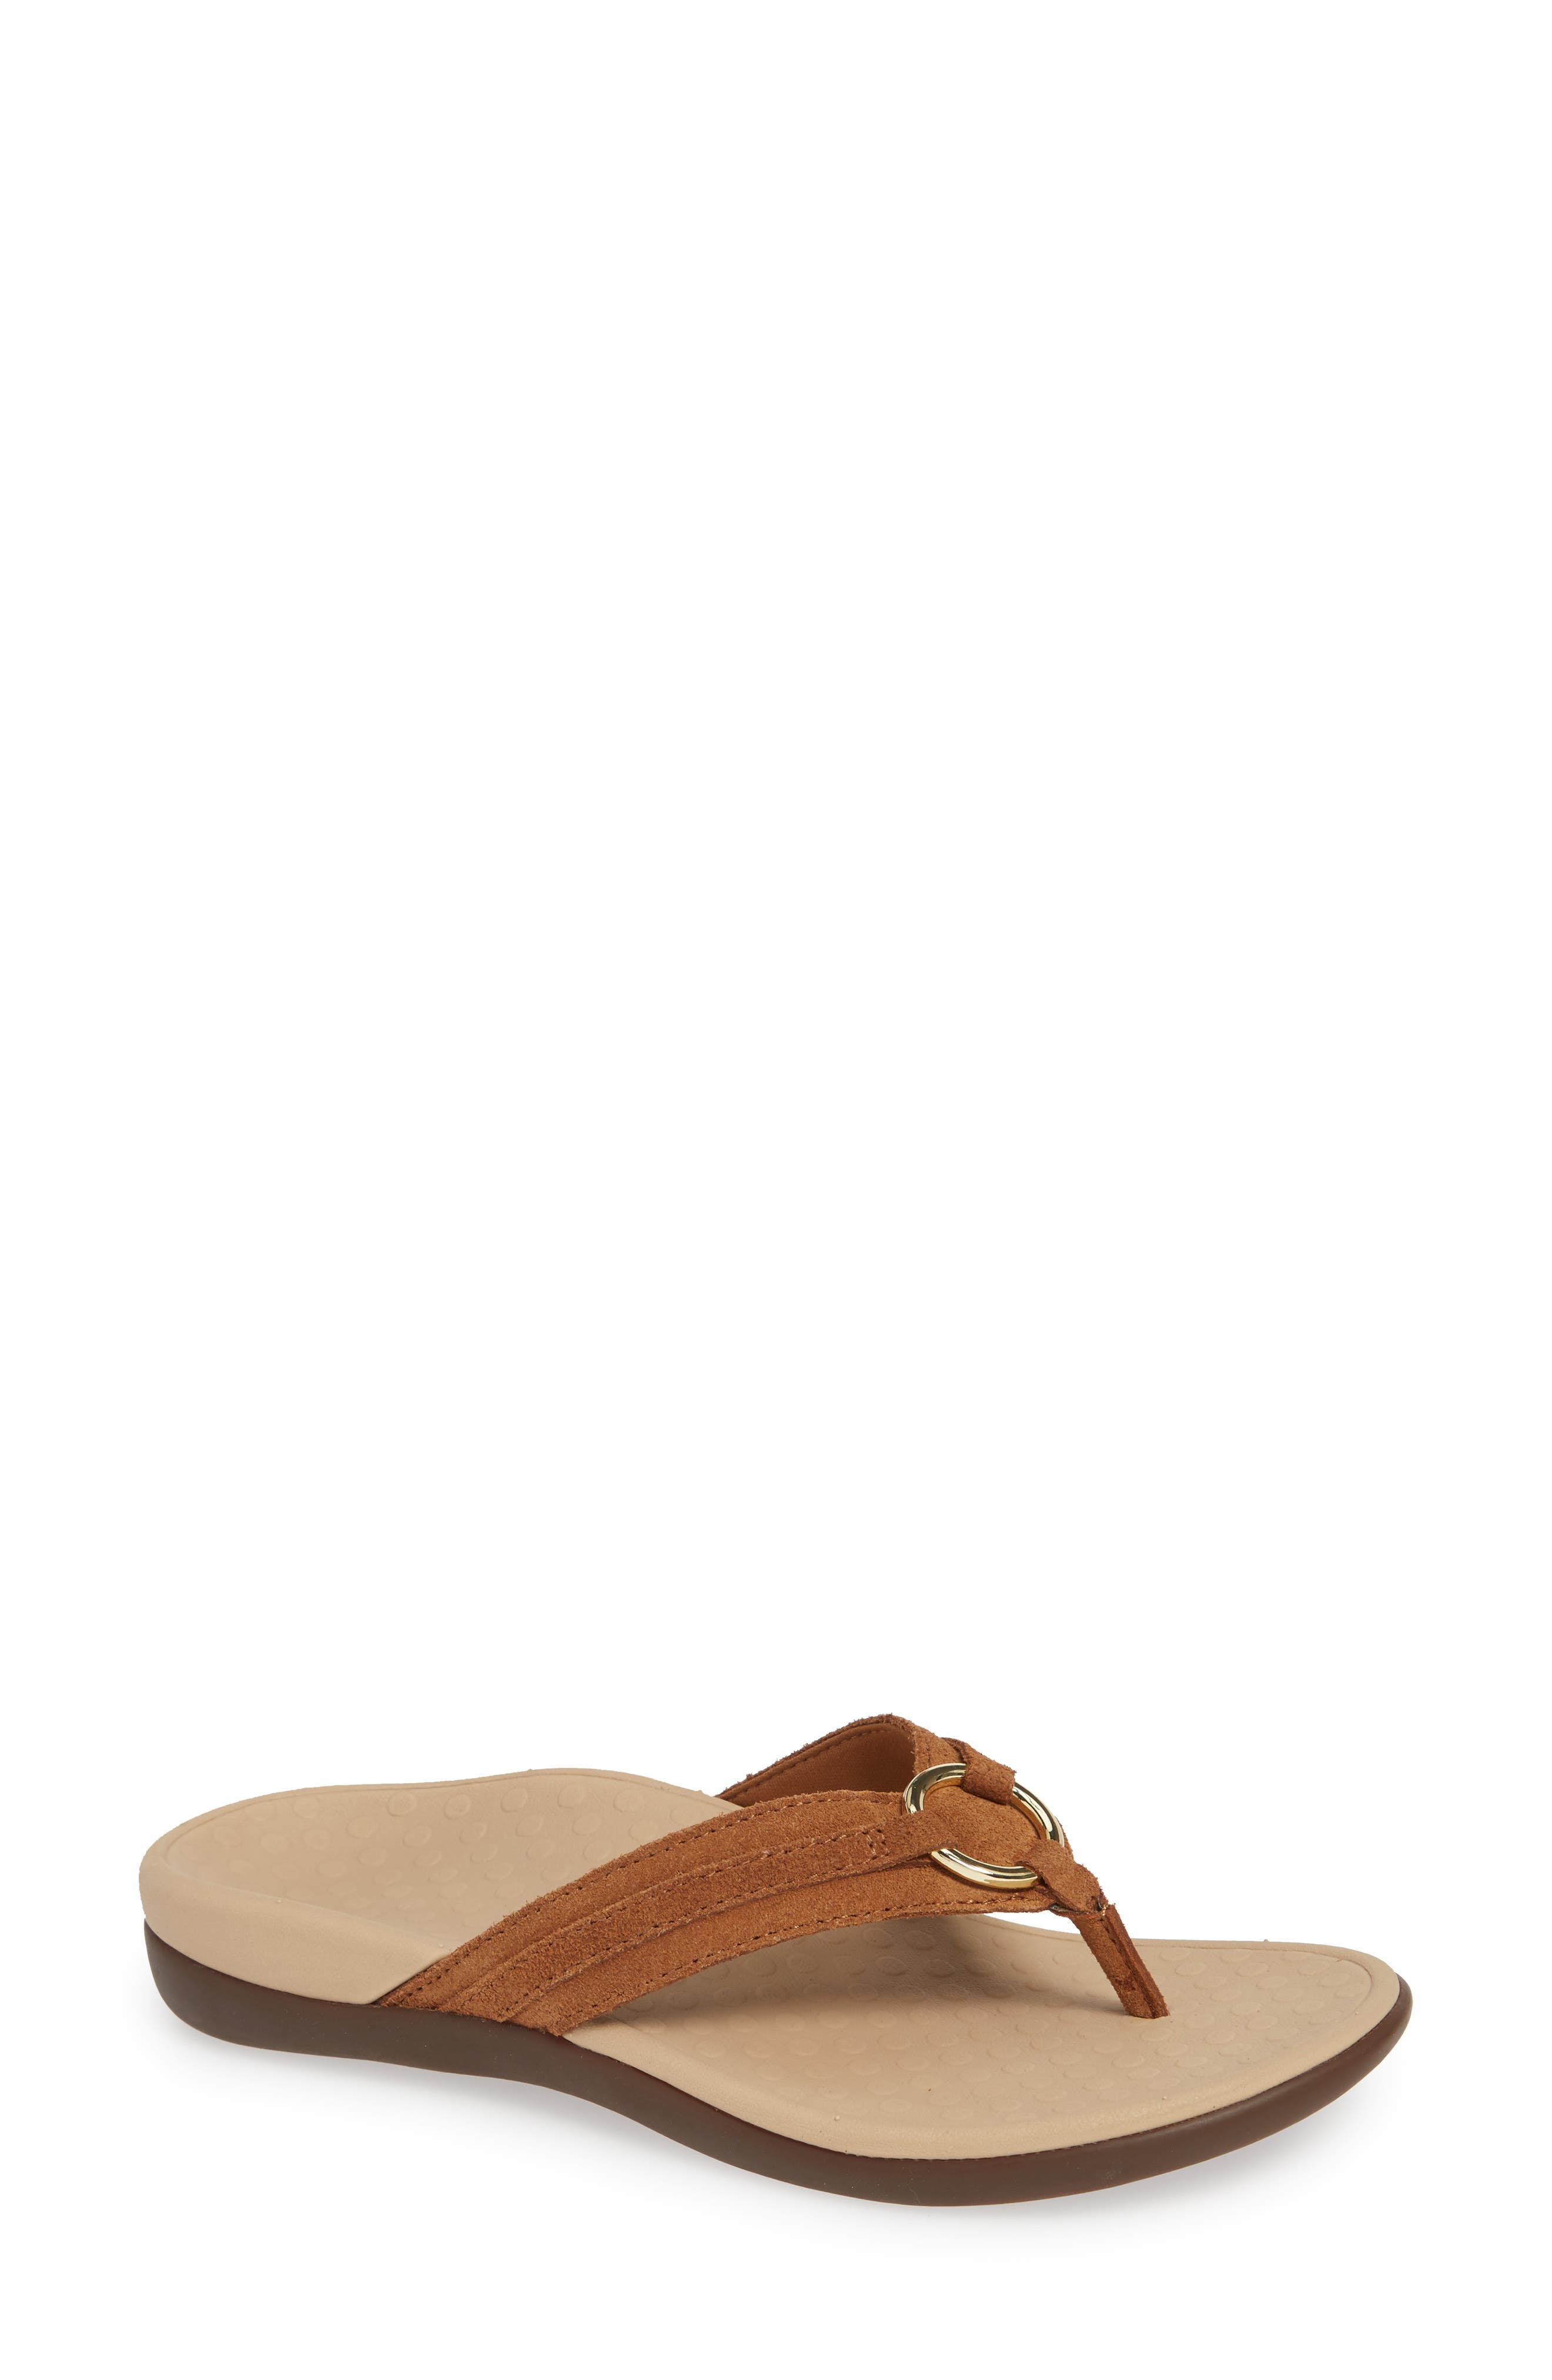 Vionic Aloe Flip Flop, Brown